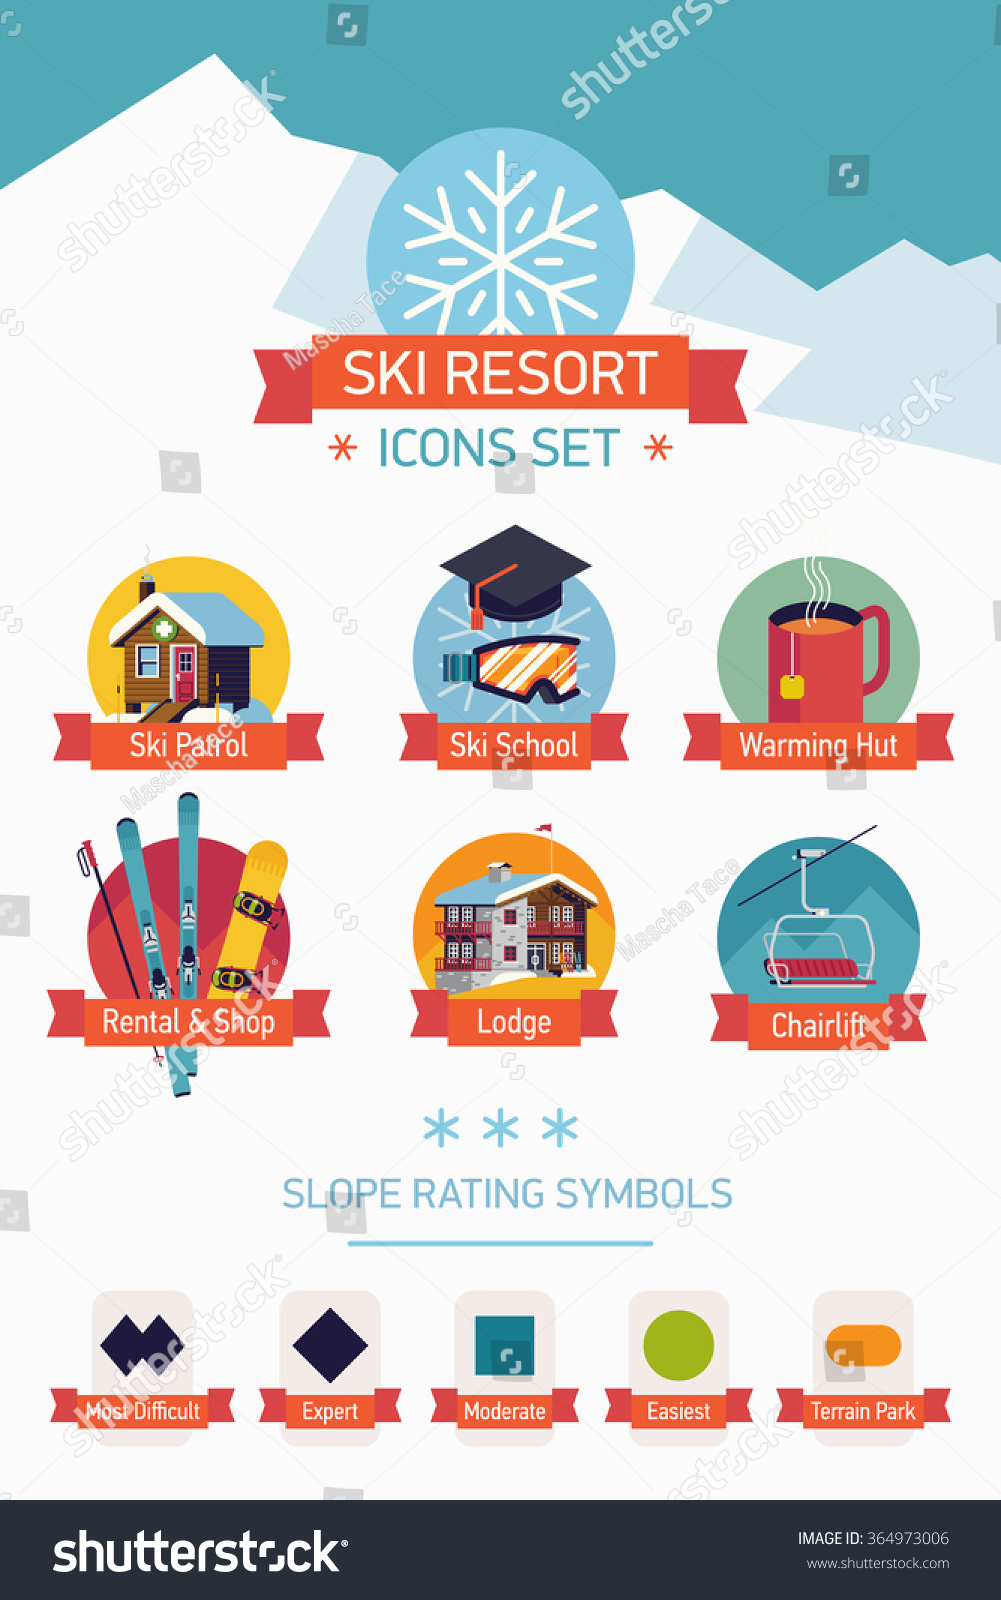 Cool Vector Ski Resort Map Legend Stock Vector Royalty Free